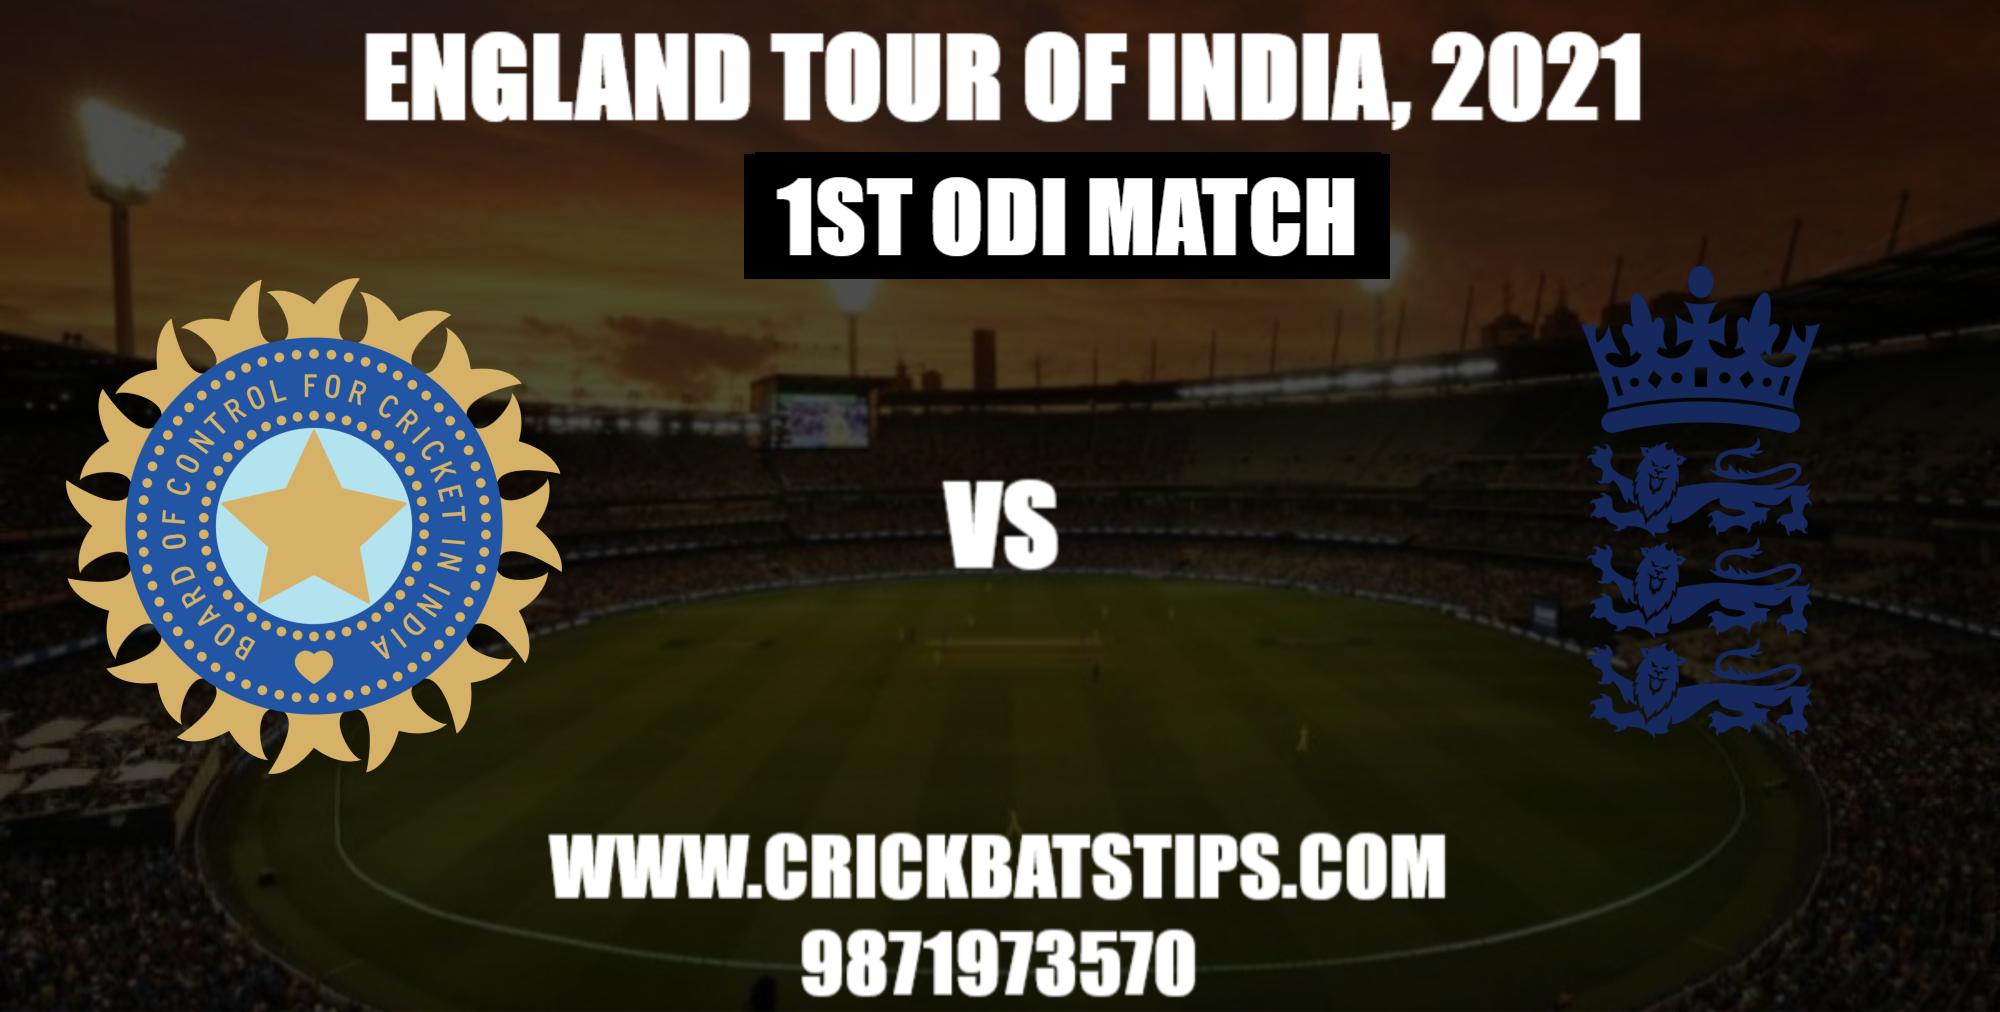 India-vs-England-1st-ODI-Match-Winner-News-&-Predictions